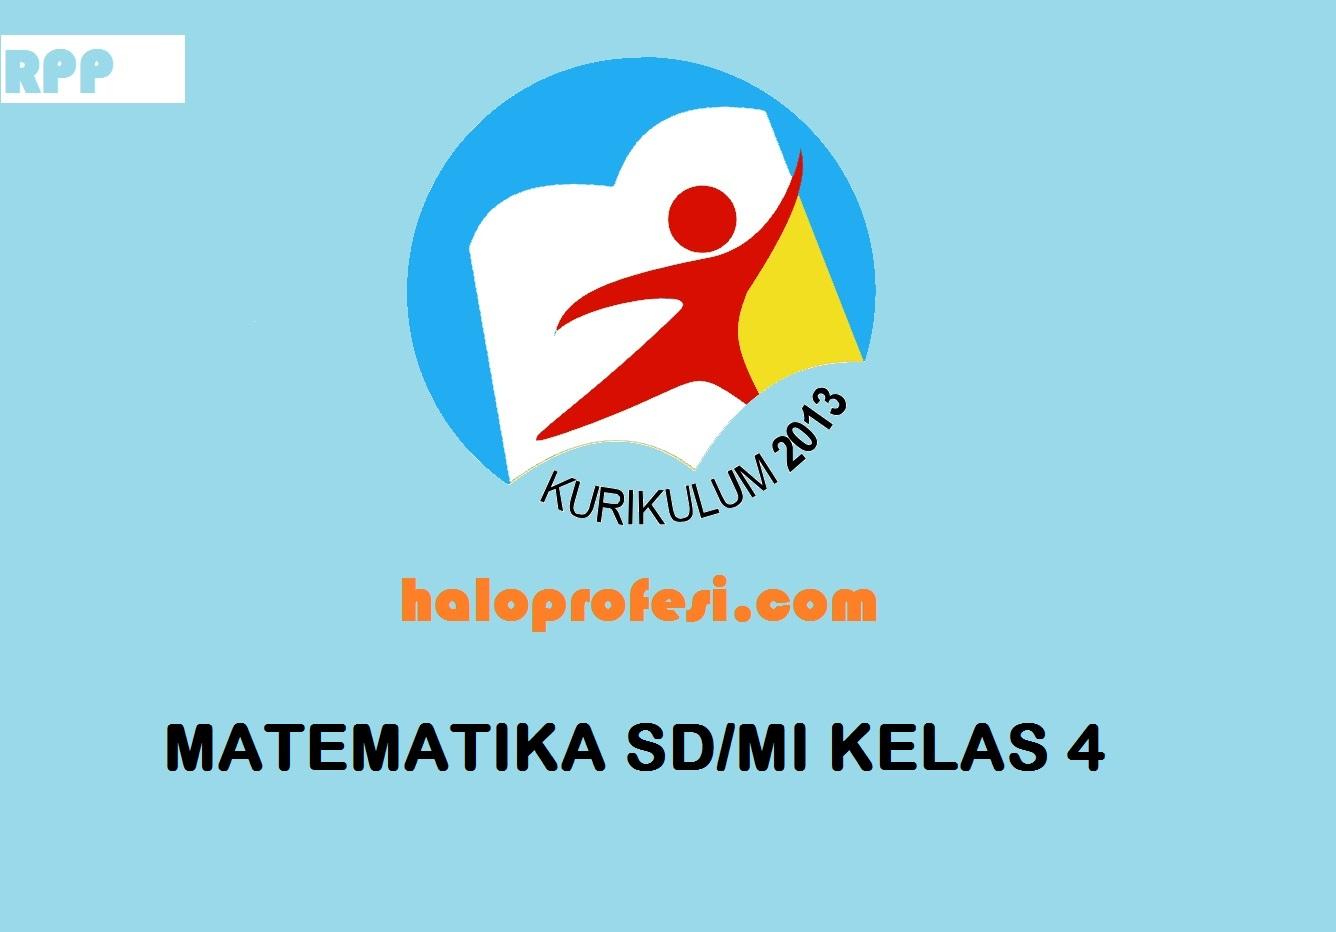 Rpp Matematika Semester 1 Dan 2 Kelas 4 Sd Mi K 2013 Revisi 2018 Ta 2019 2020 Haloprofesi